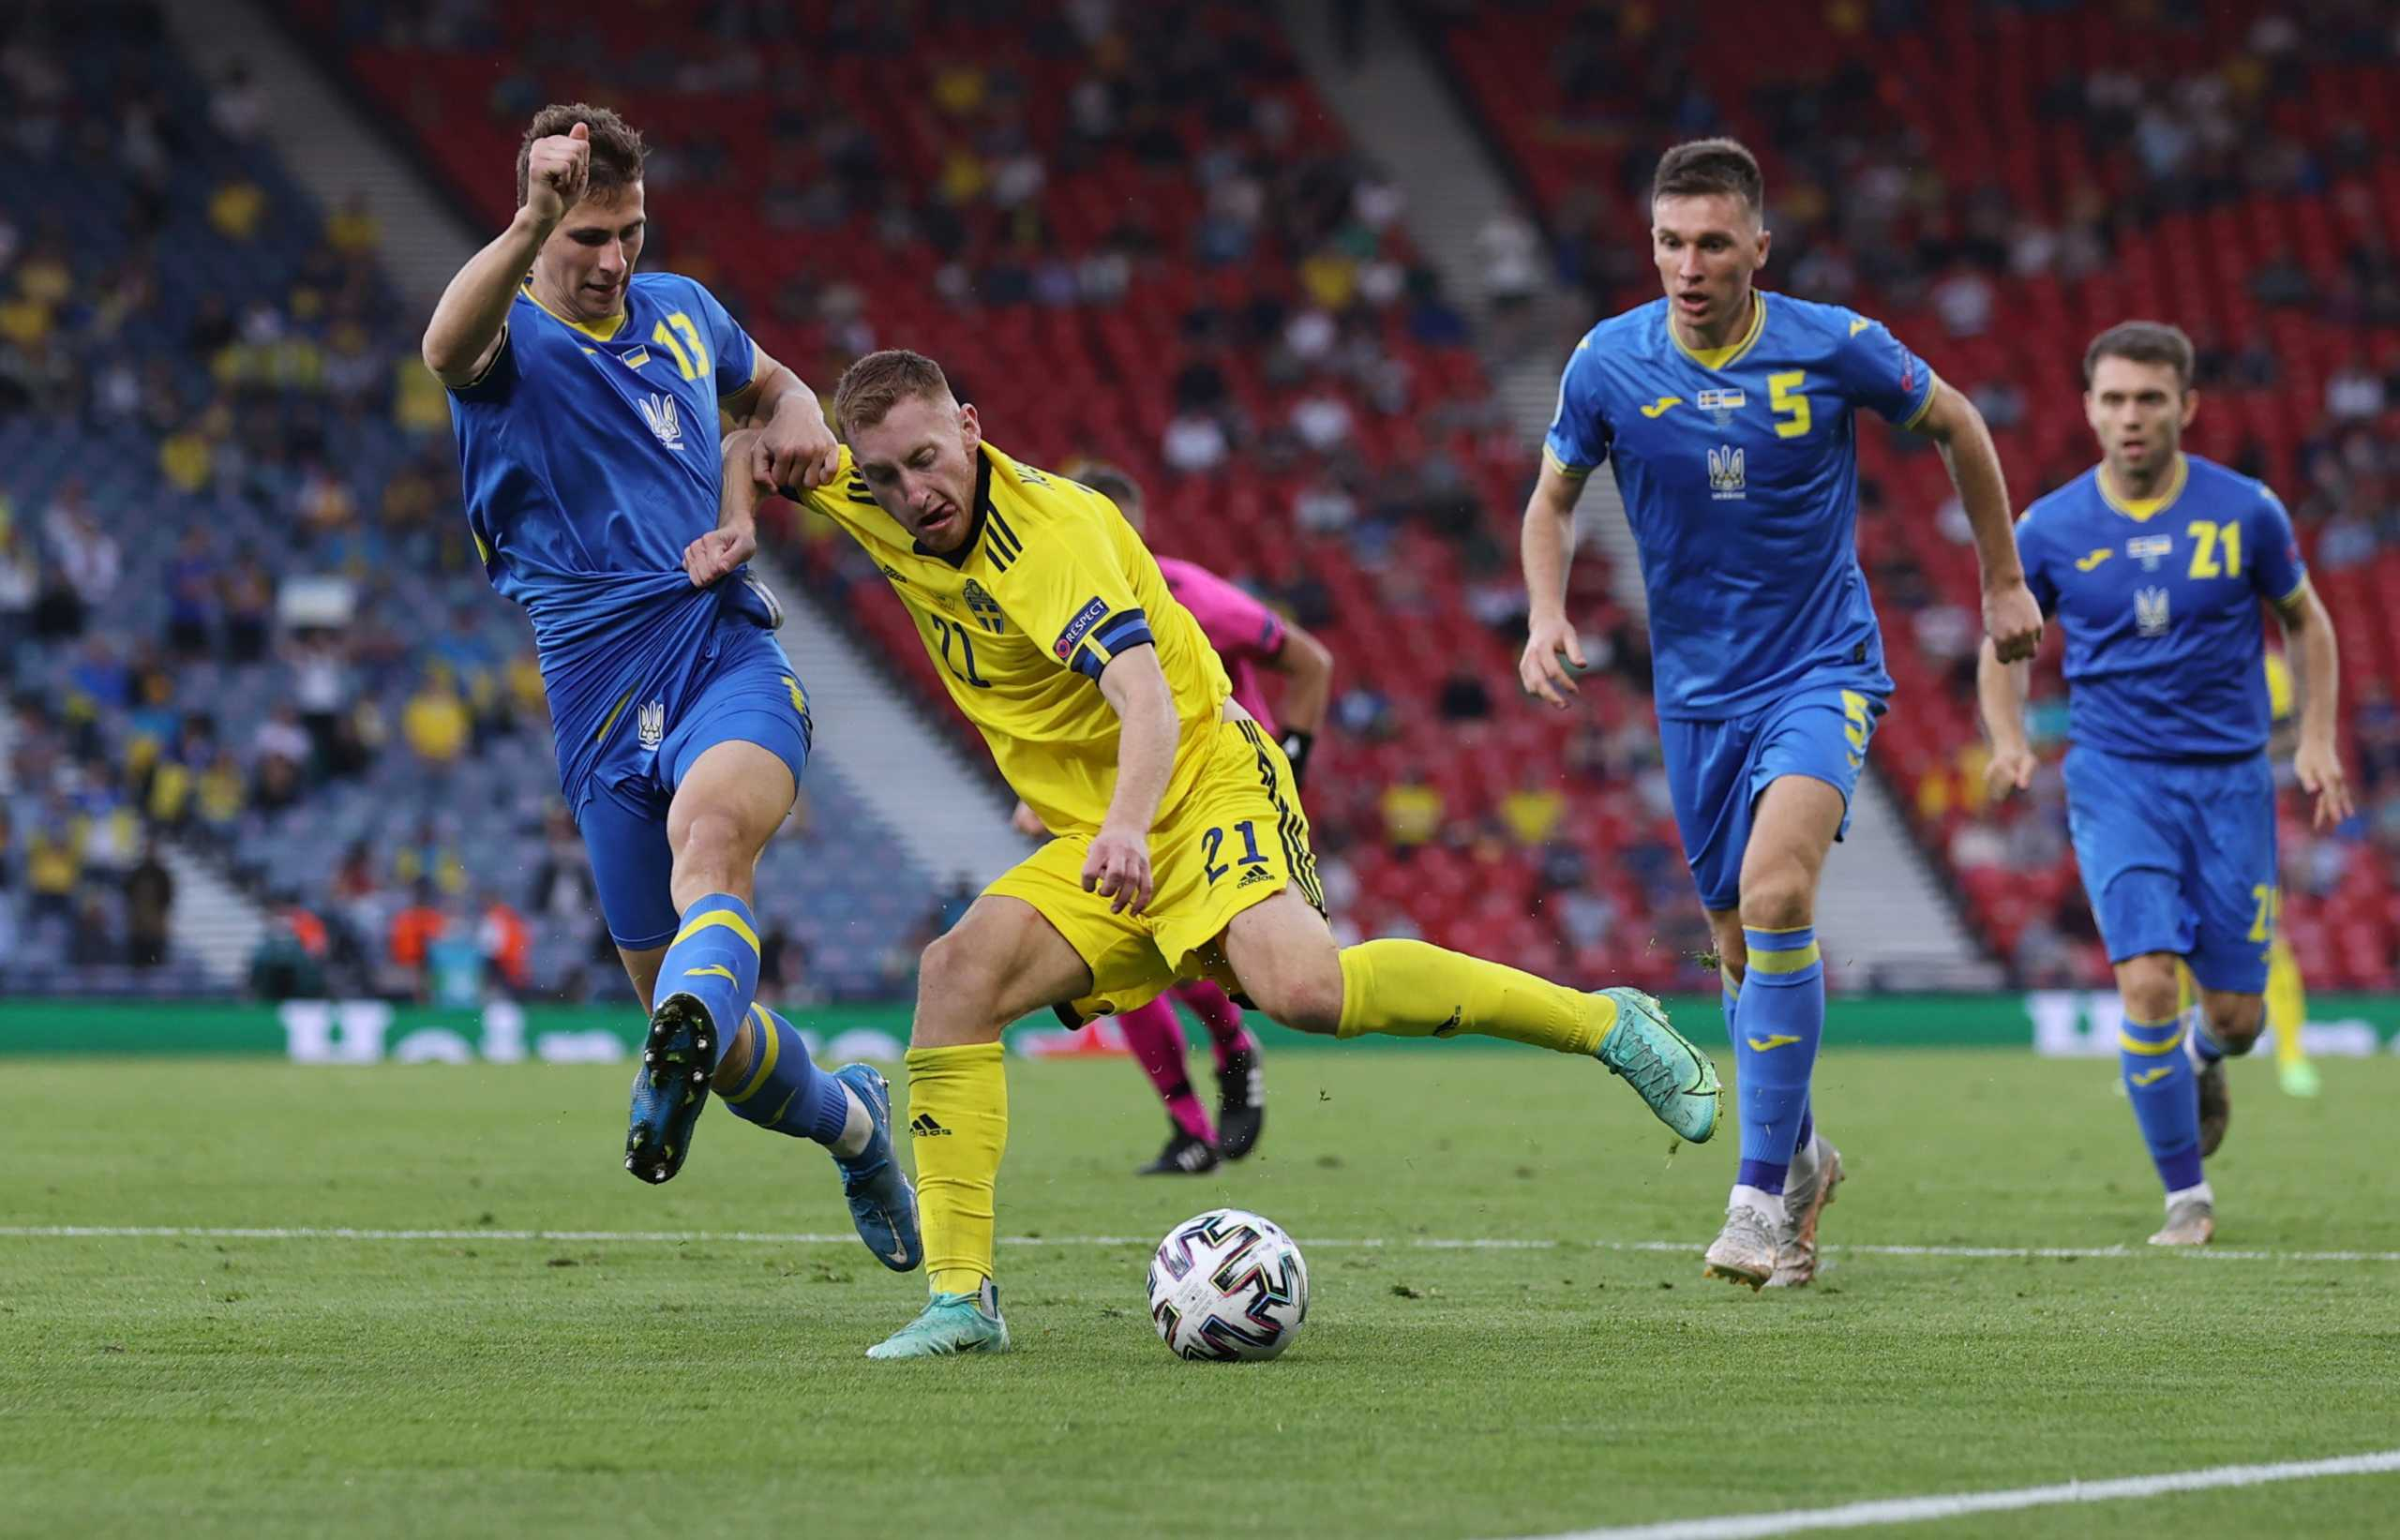 Euro 2020, Σουηδία – Ουκρανία LIVE